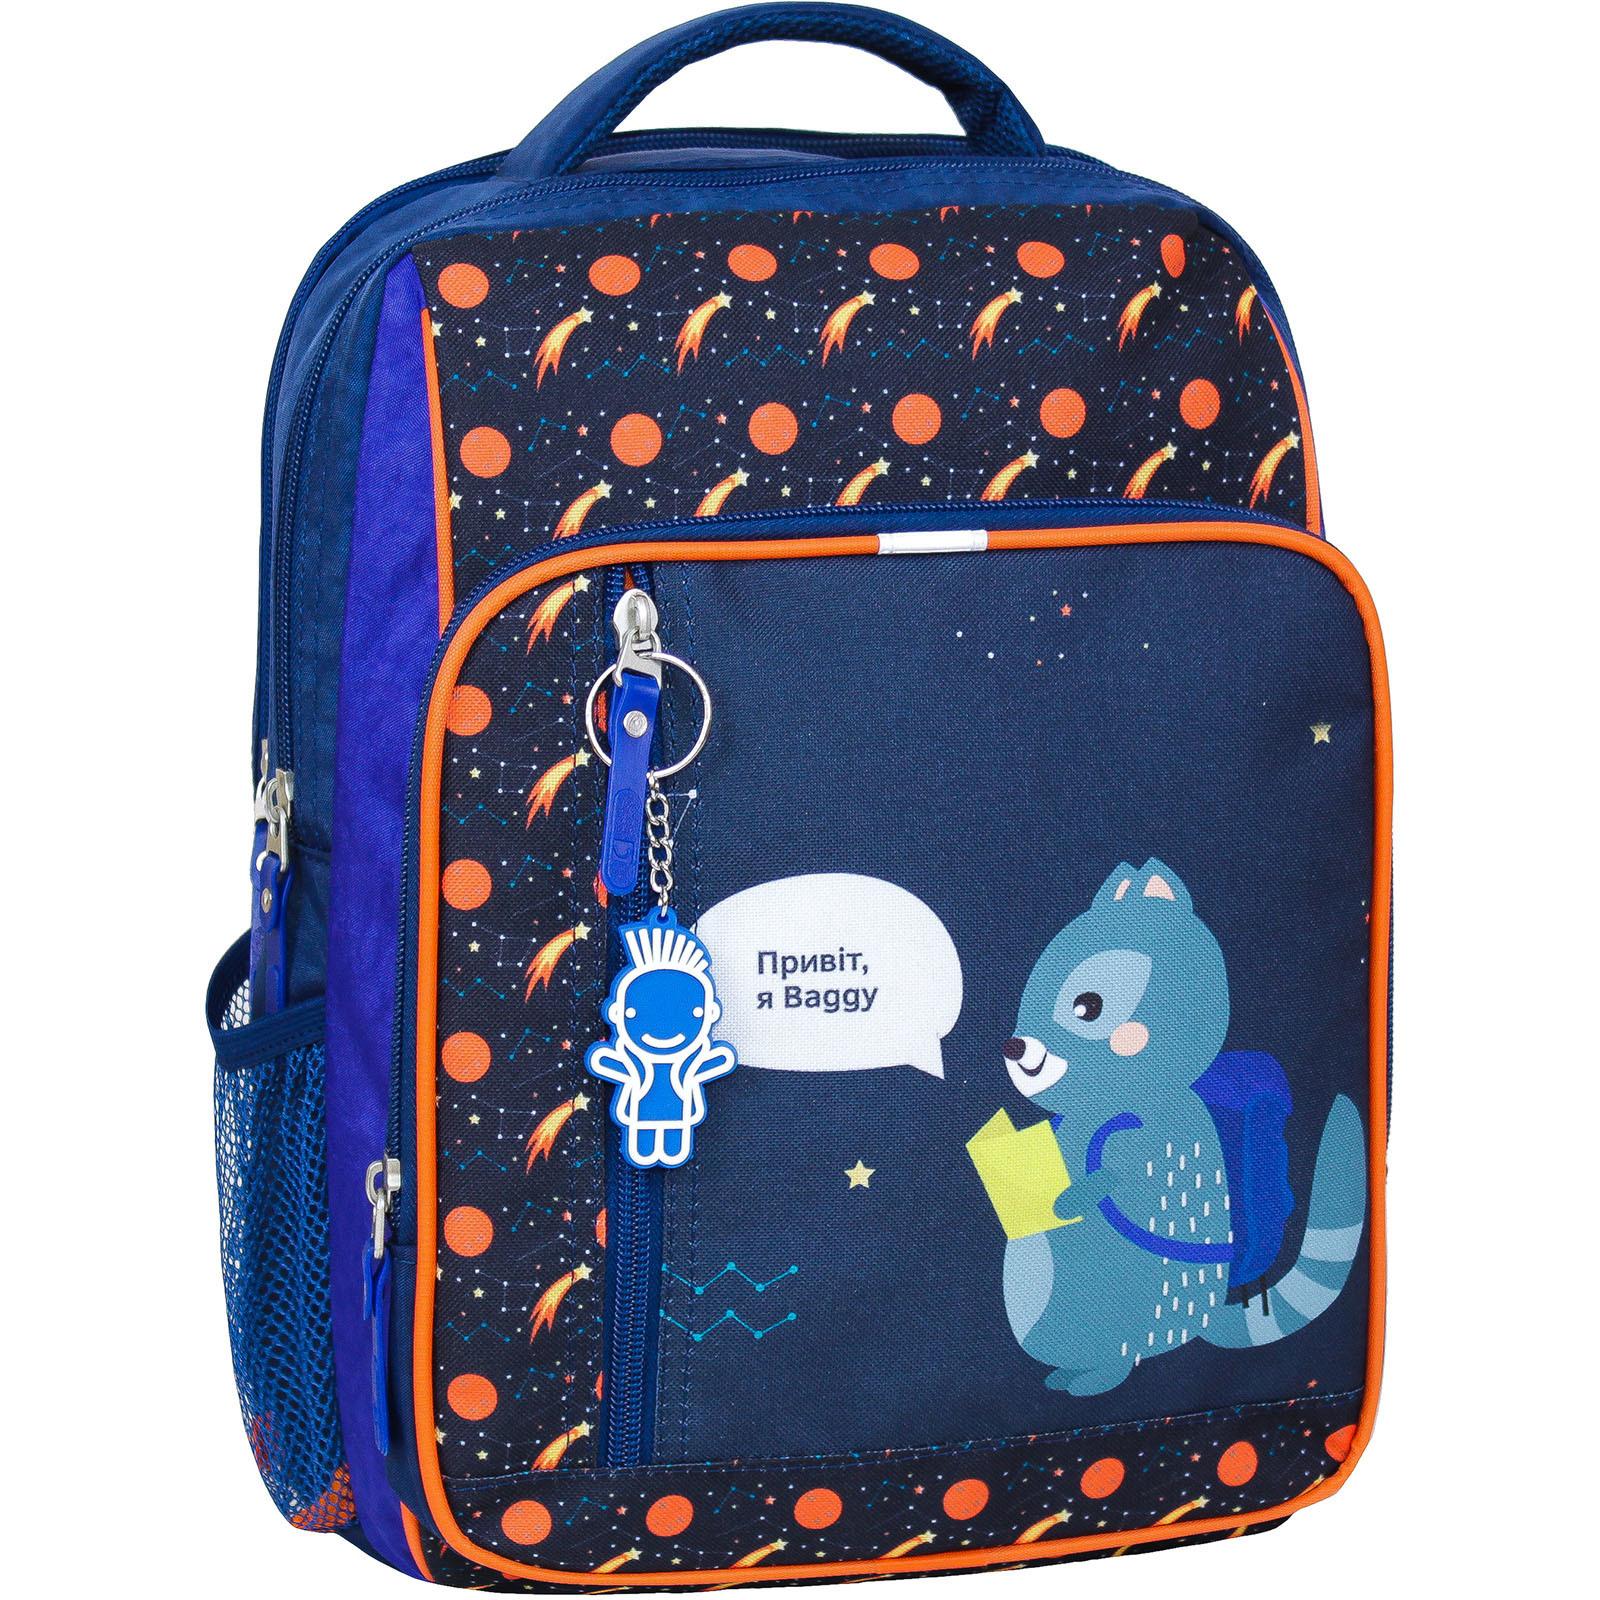 Школьные рюкзаки Рюкзак школьный Bagland Школьник 8 л. 225 синий 429 (00112702) IMG_4843-суб429.jpg